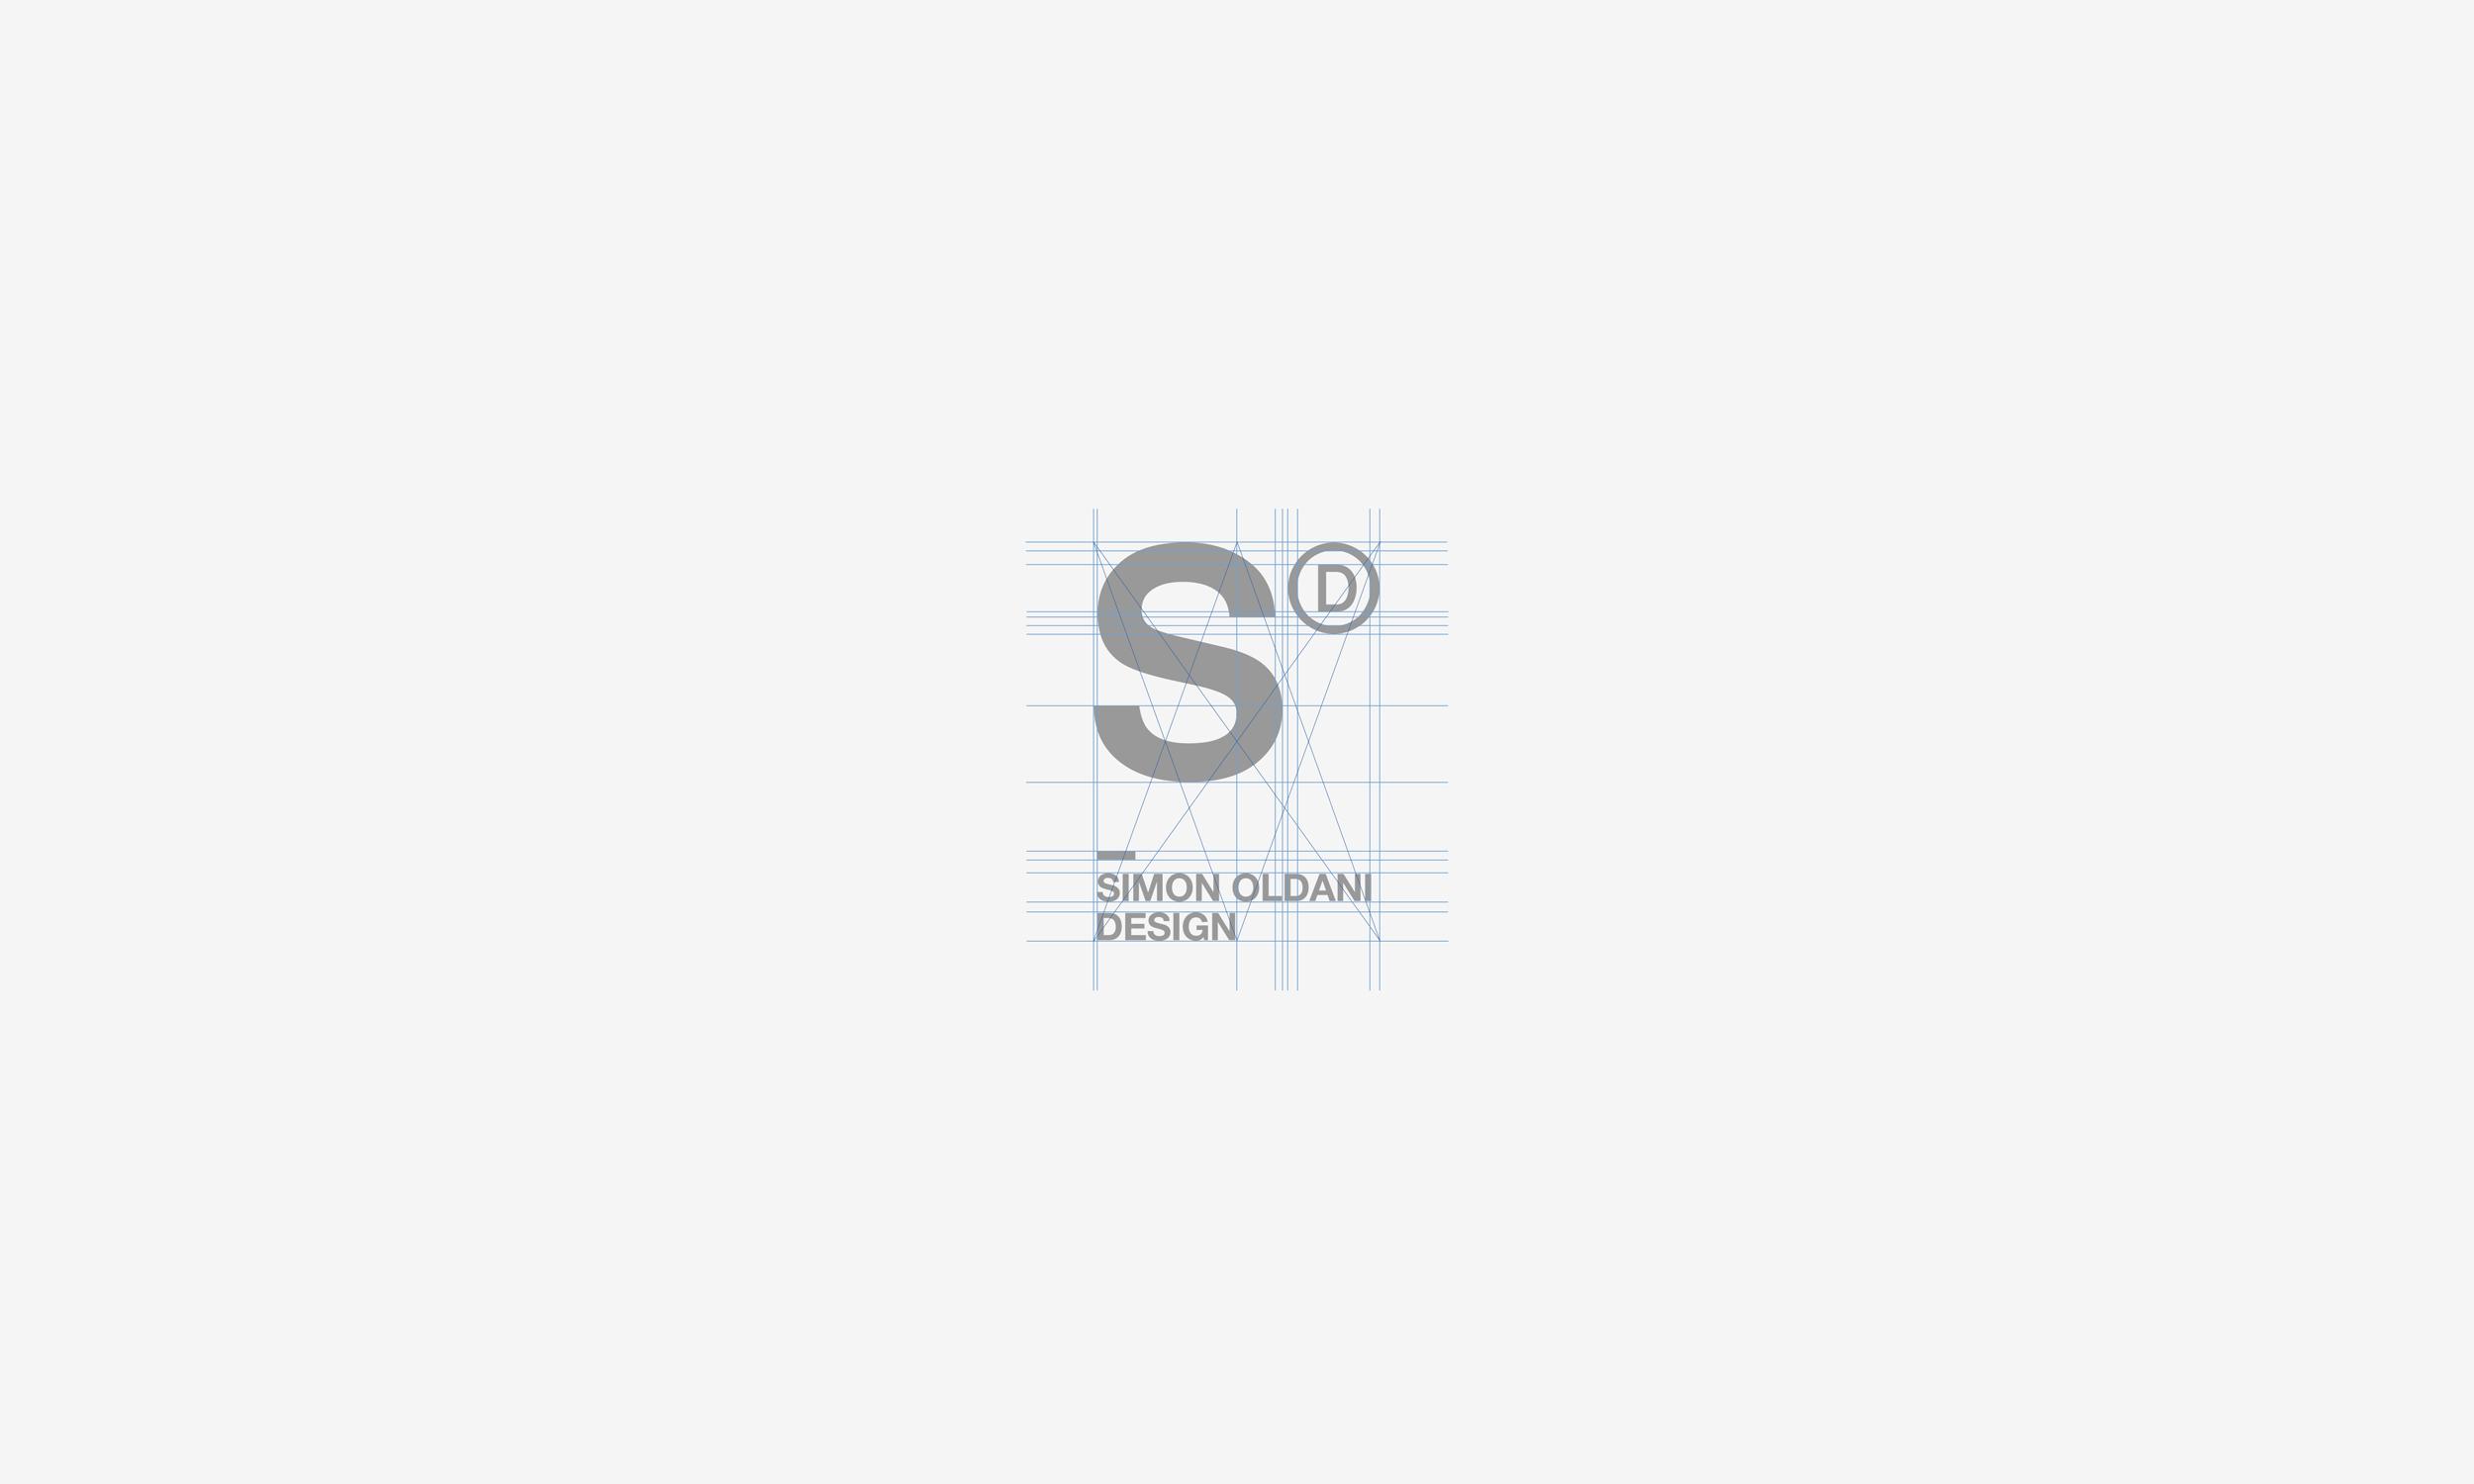 Simon Oldani Design logo vertical construction